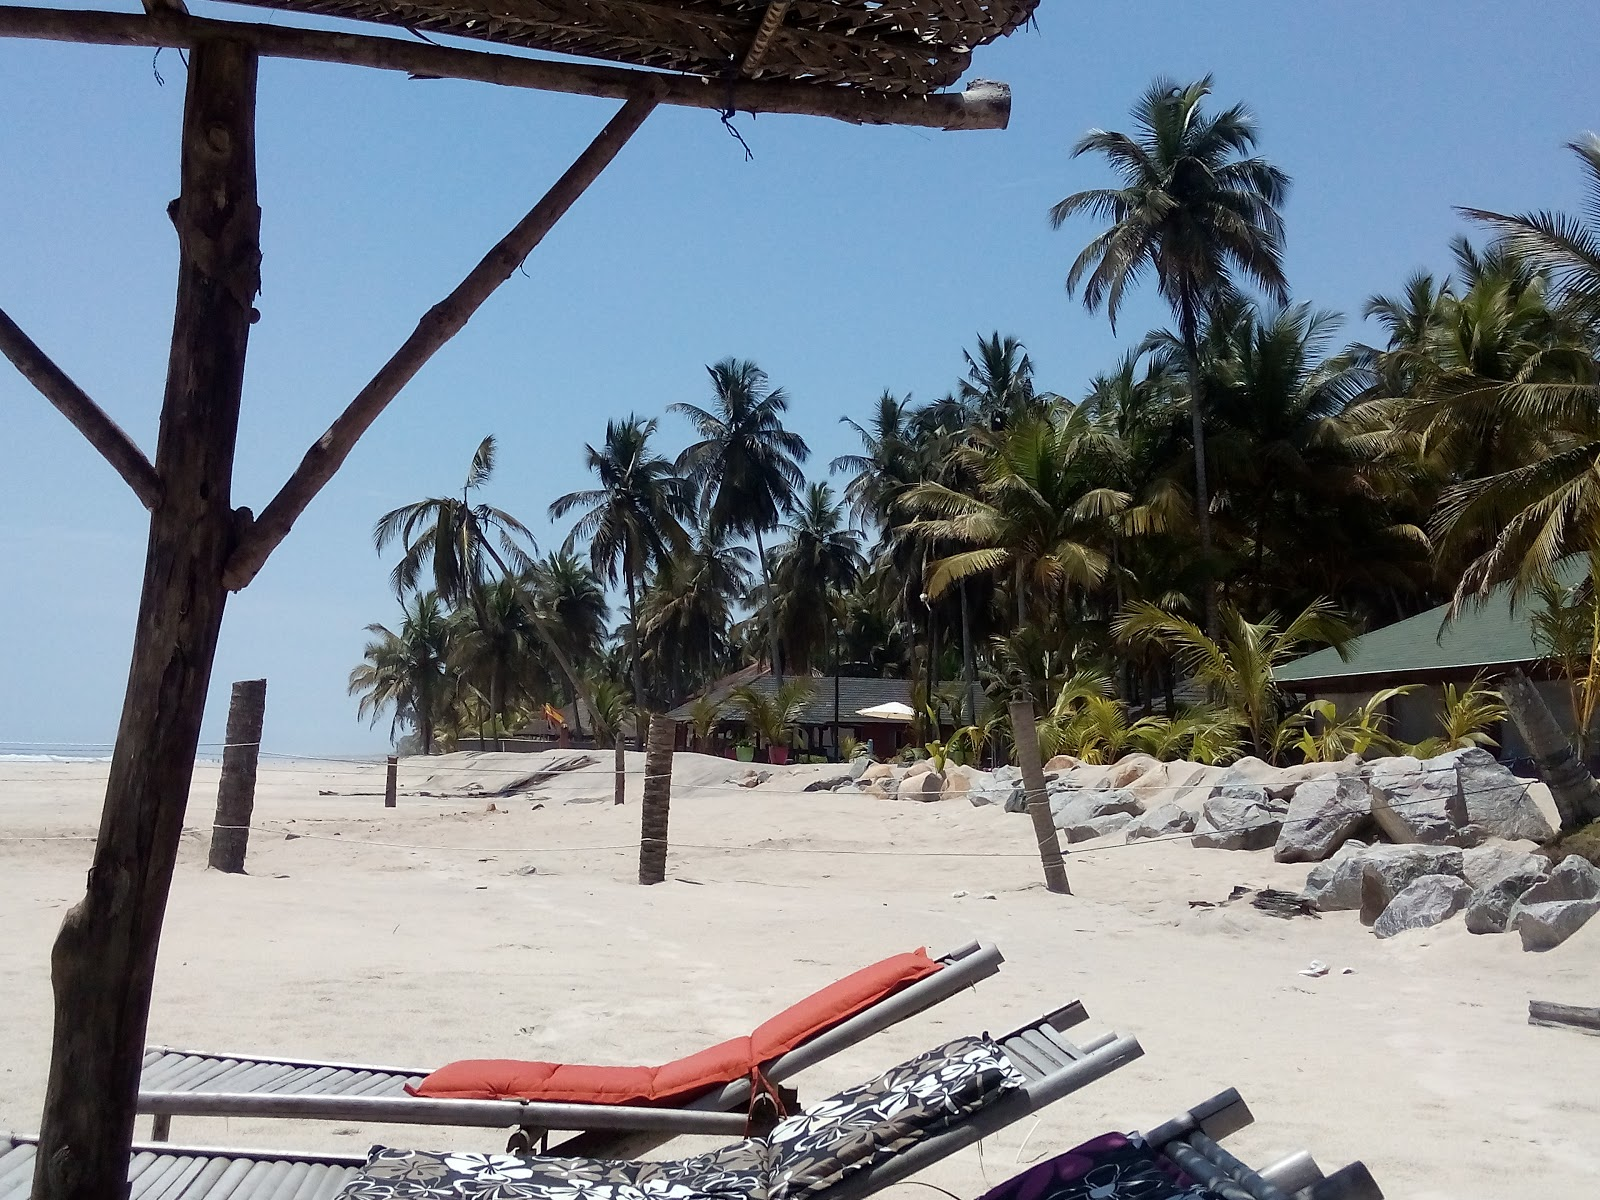 Hotel Bar Restaurant Coki Plage Grand Bassam Cote D Ivoire